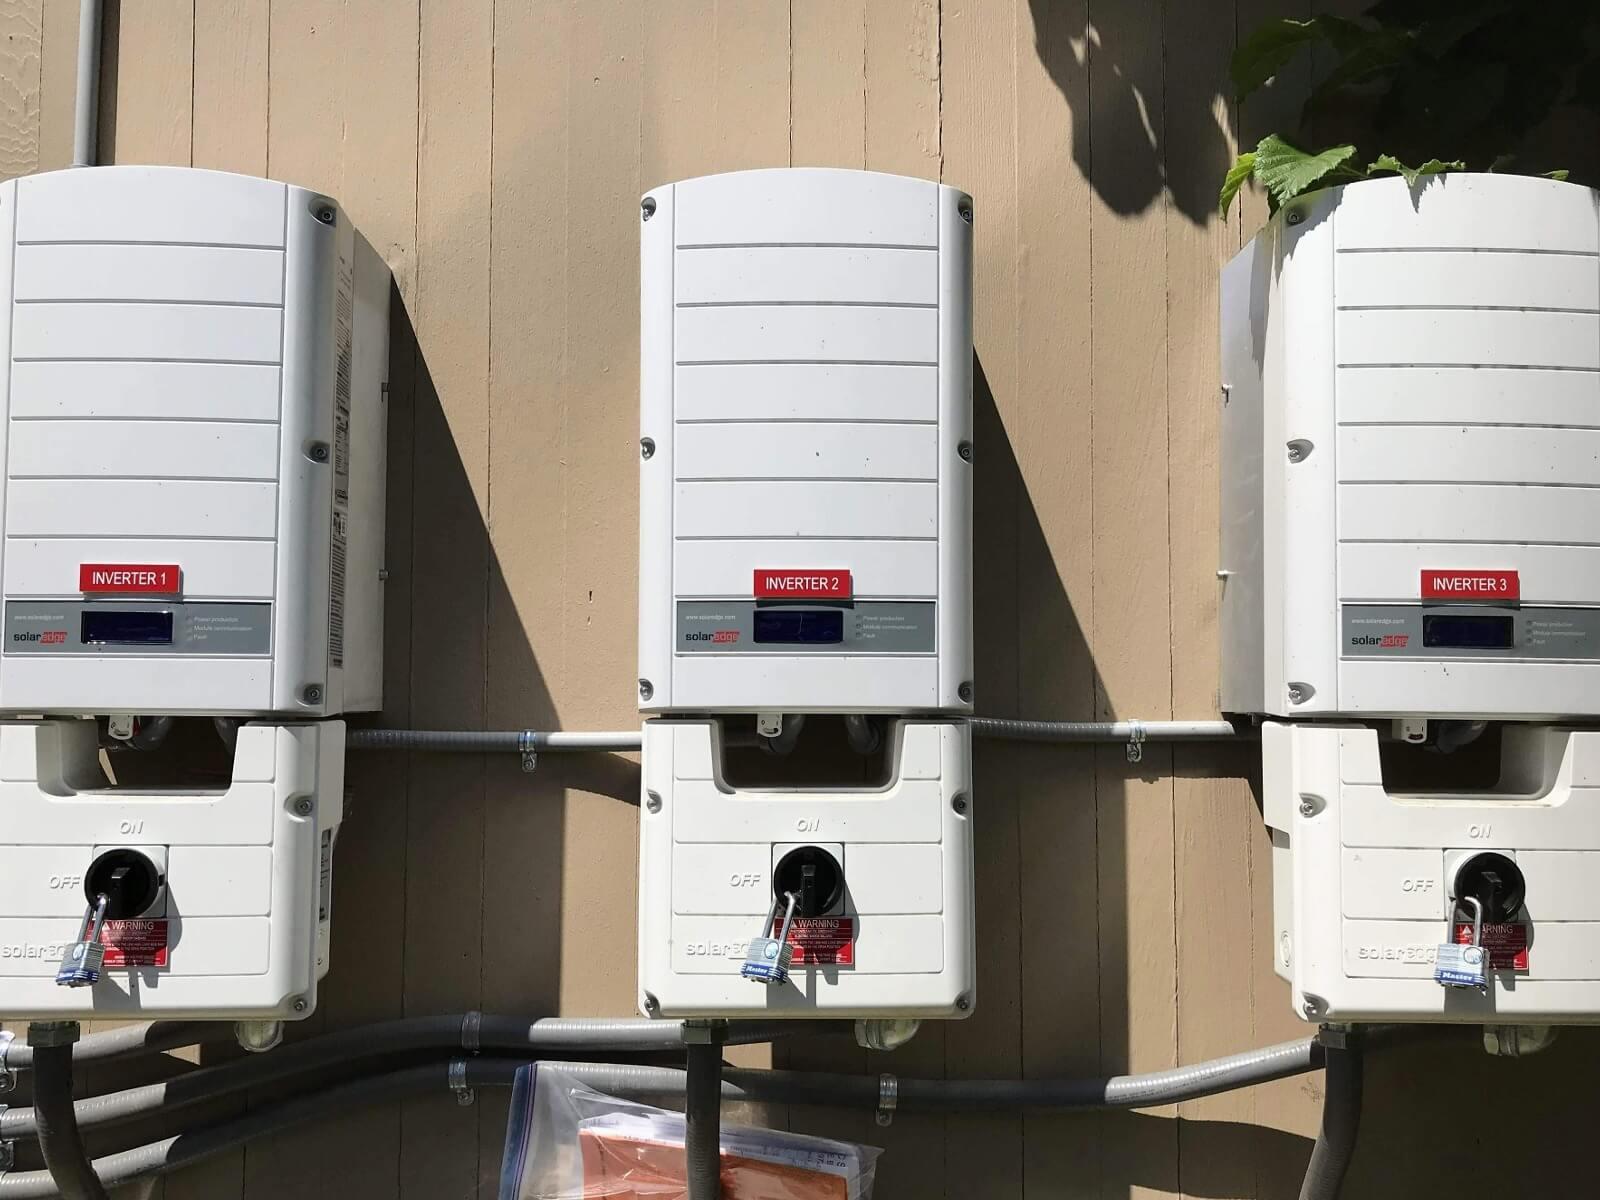 3 solaredge solar inverters.jpeg